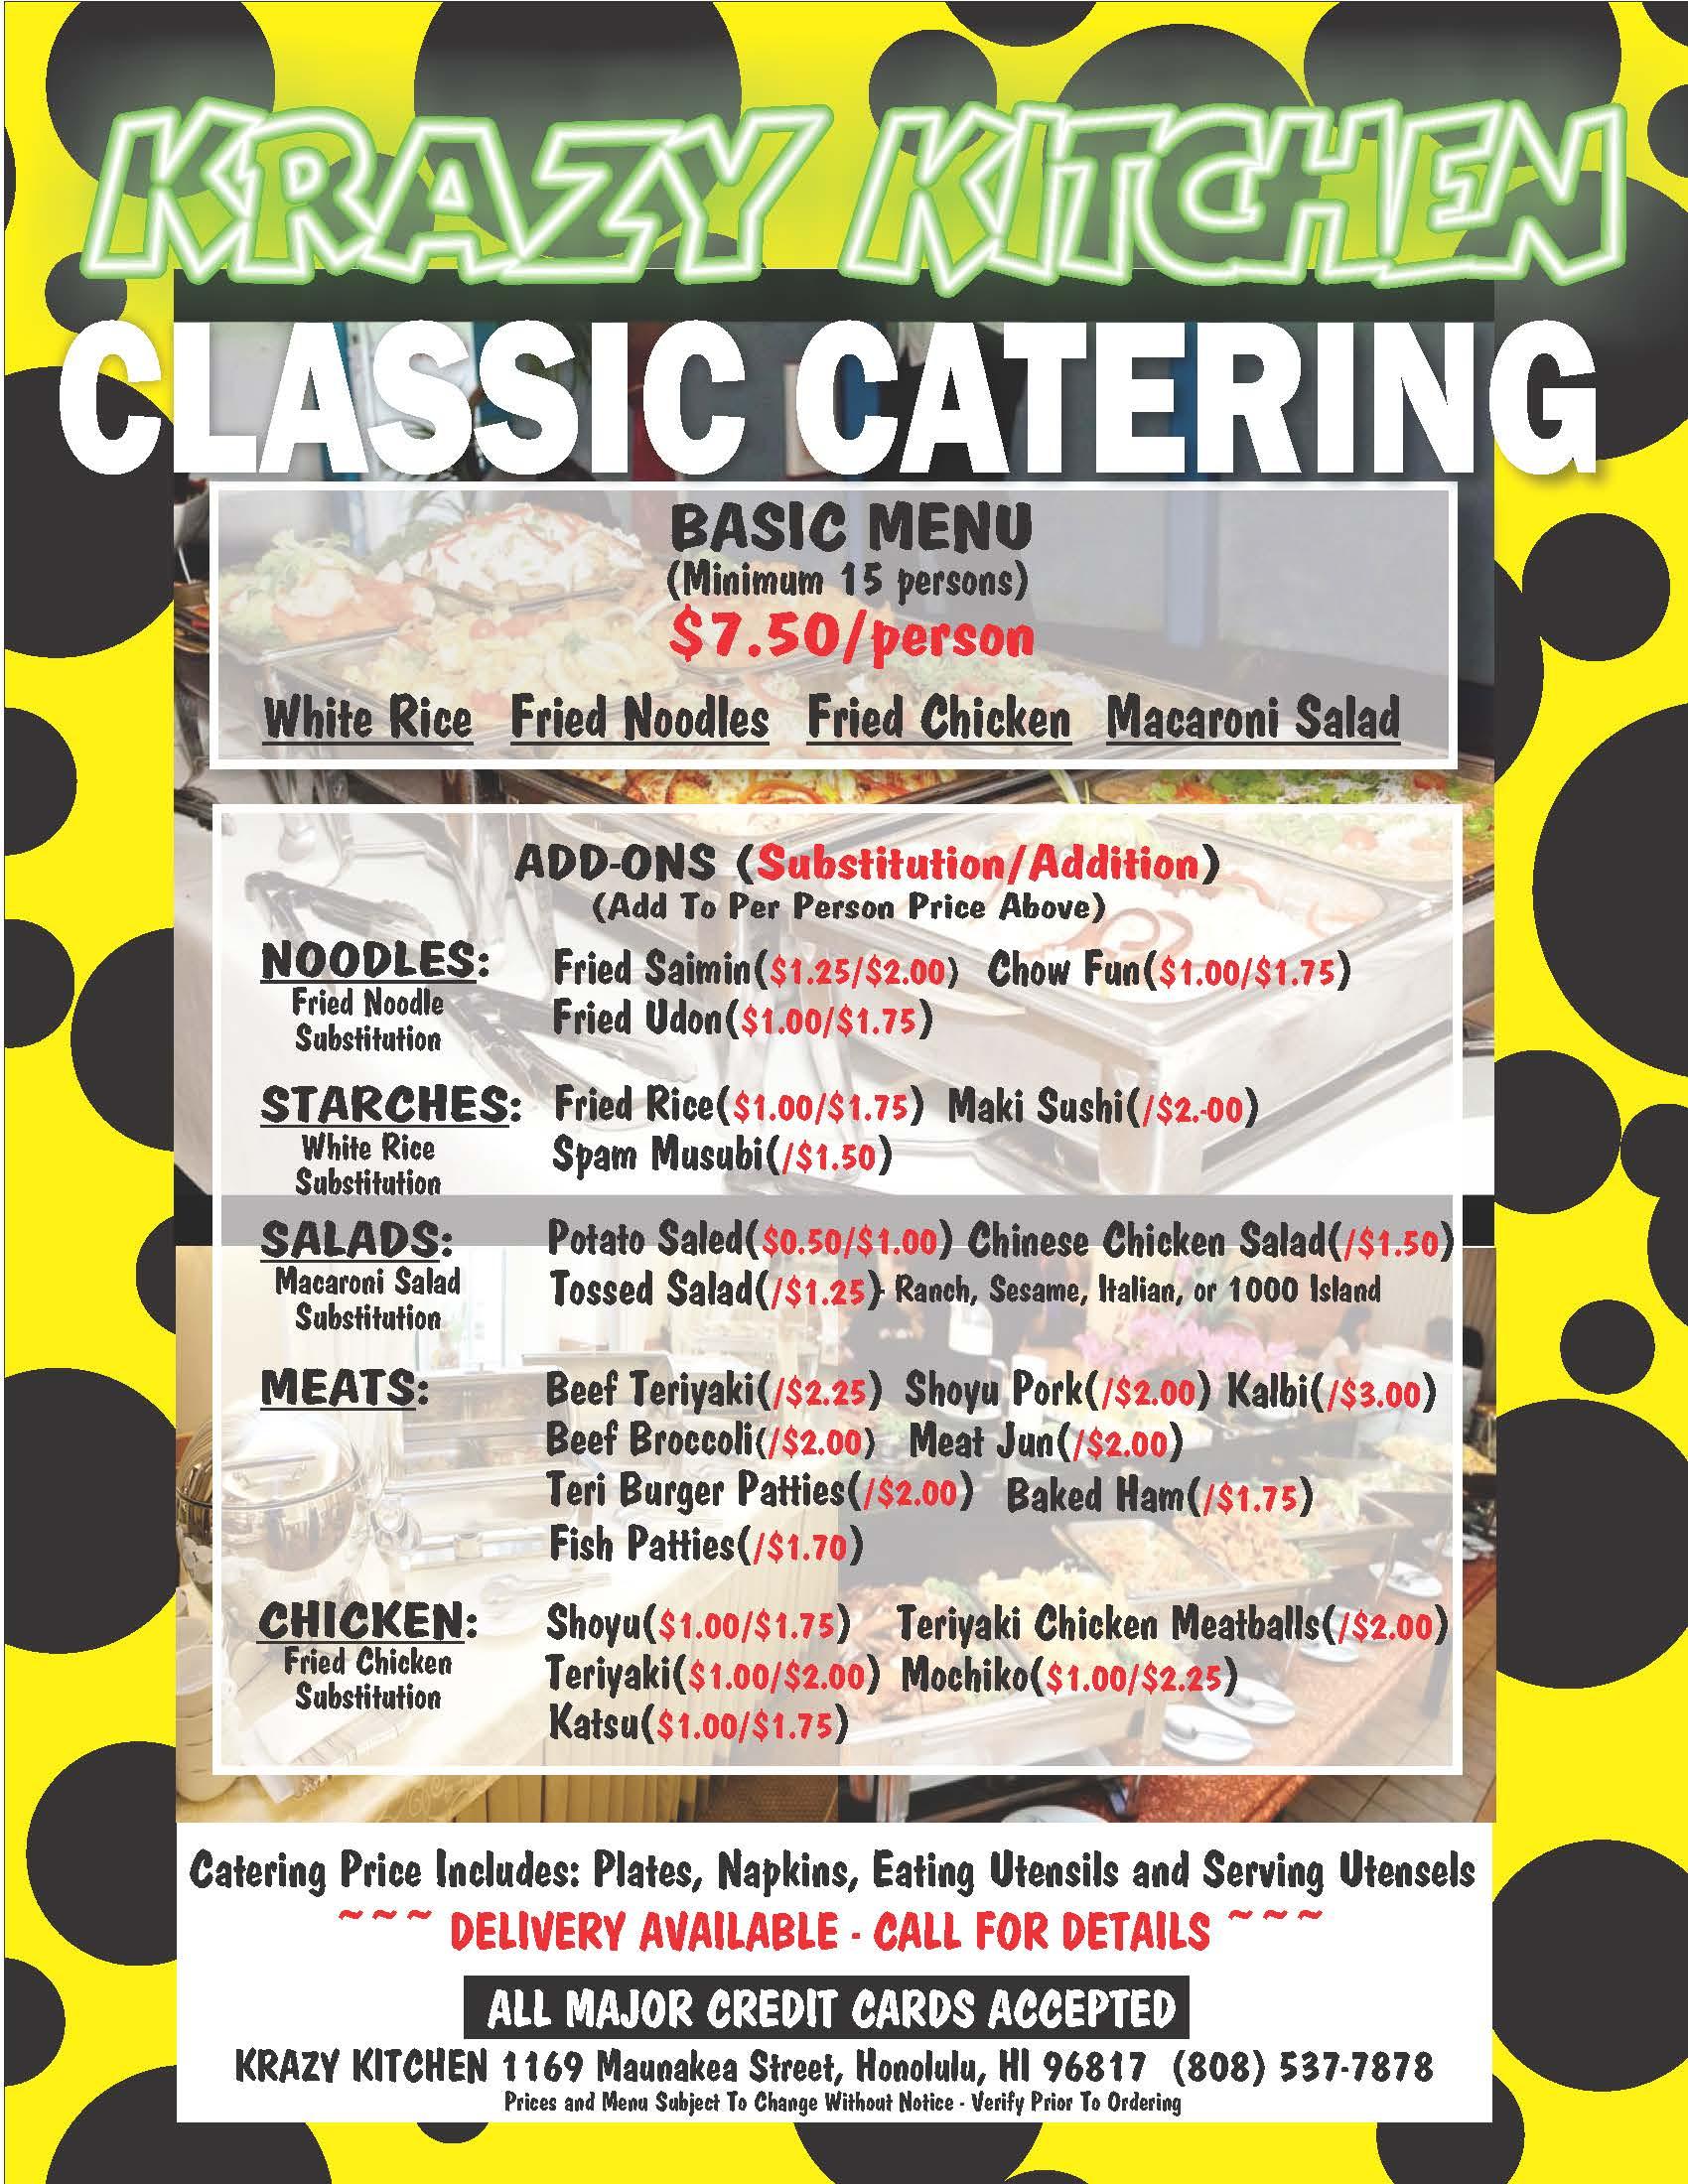 Krazy Kitchen menu classic catering